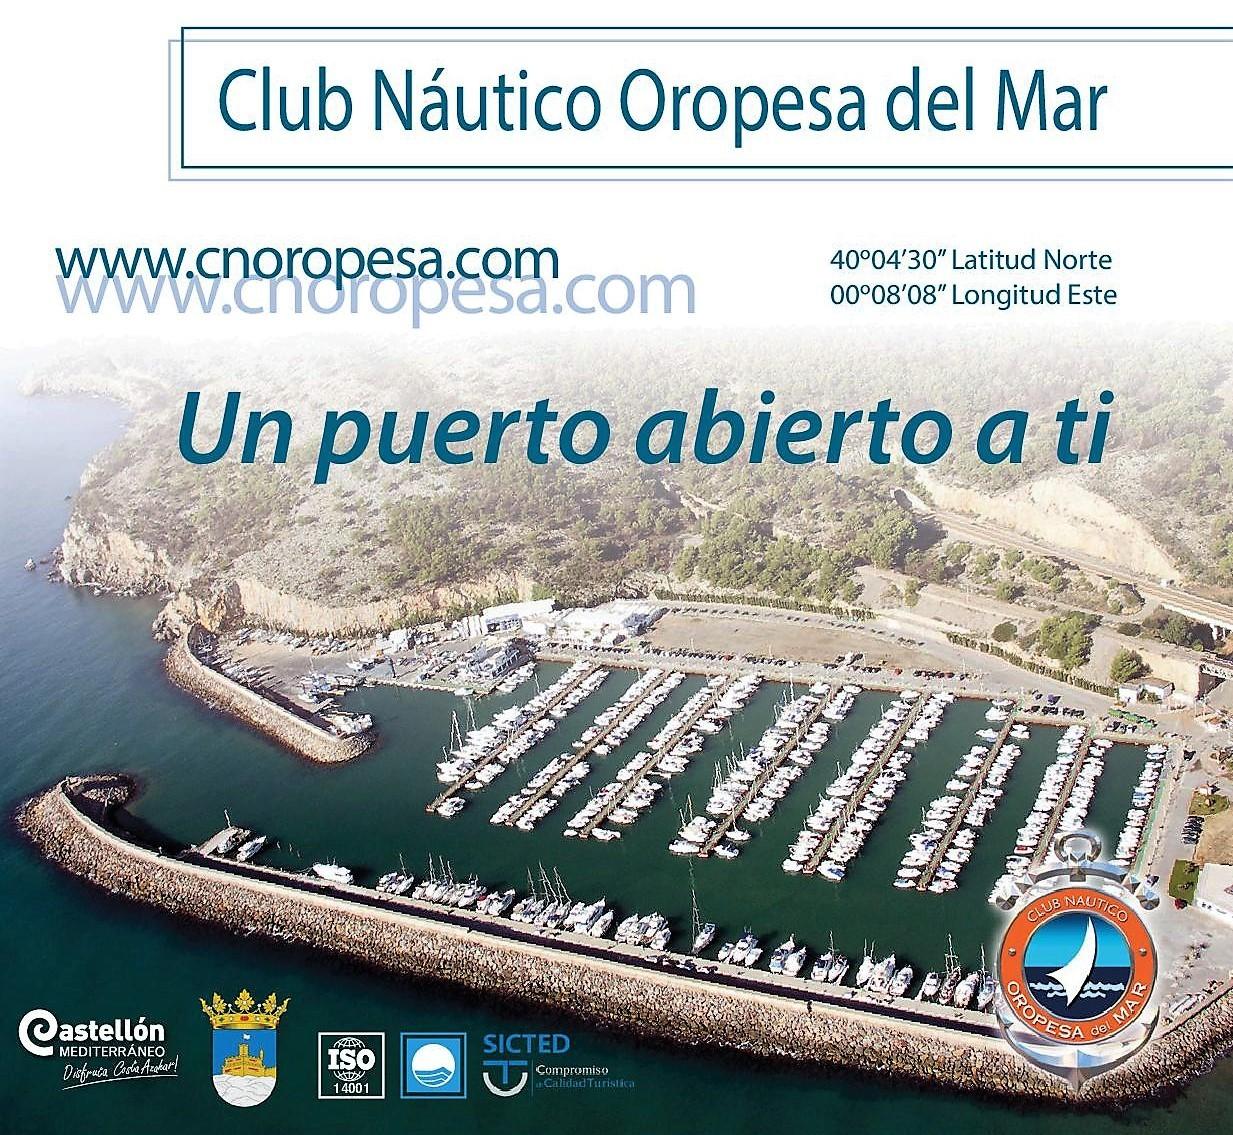 CN OROPESA PÀG 1 - Nuevo tríptico informativo del club.